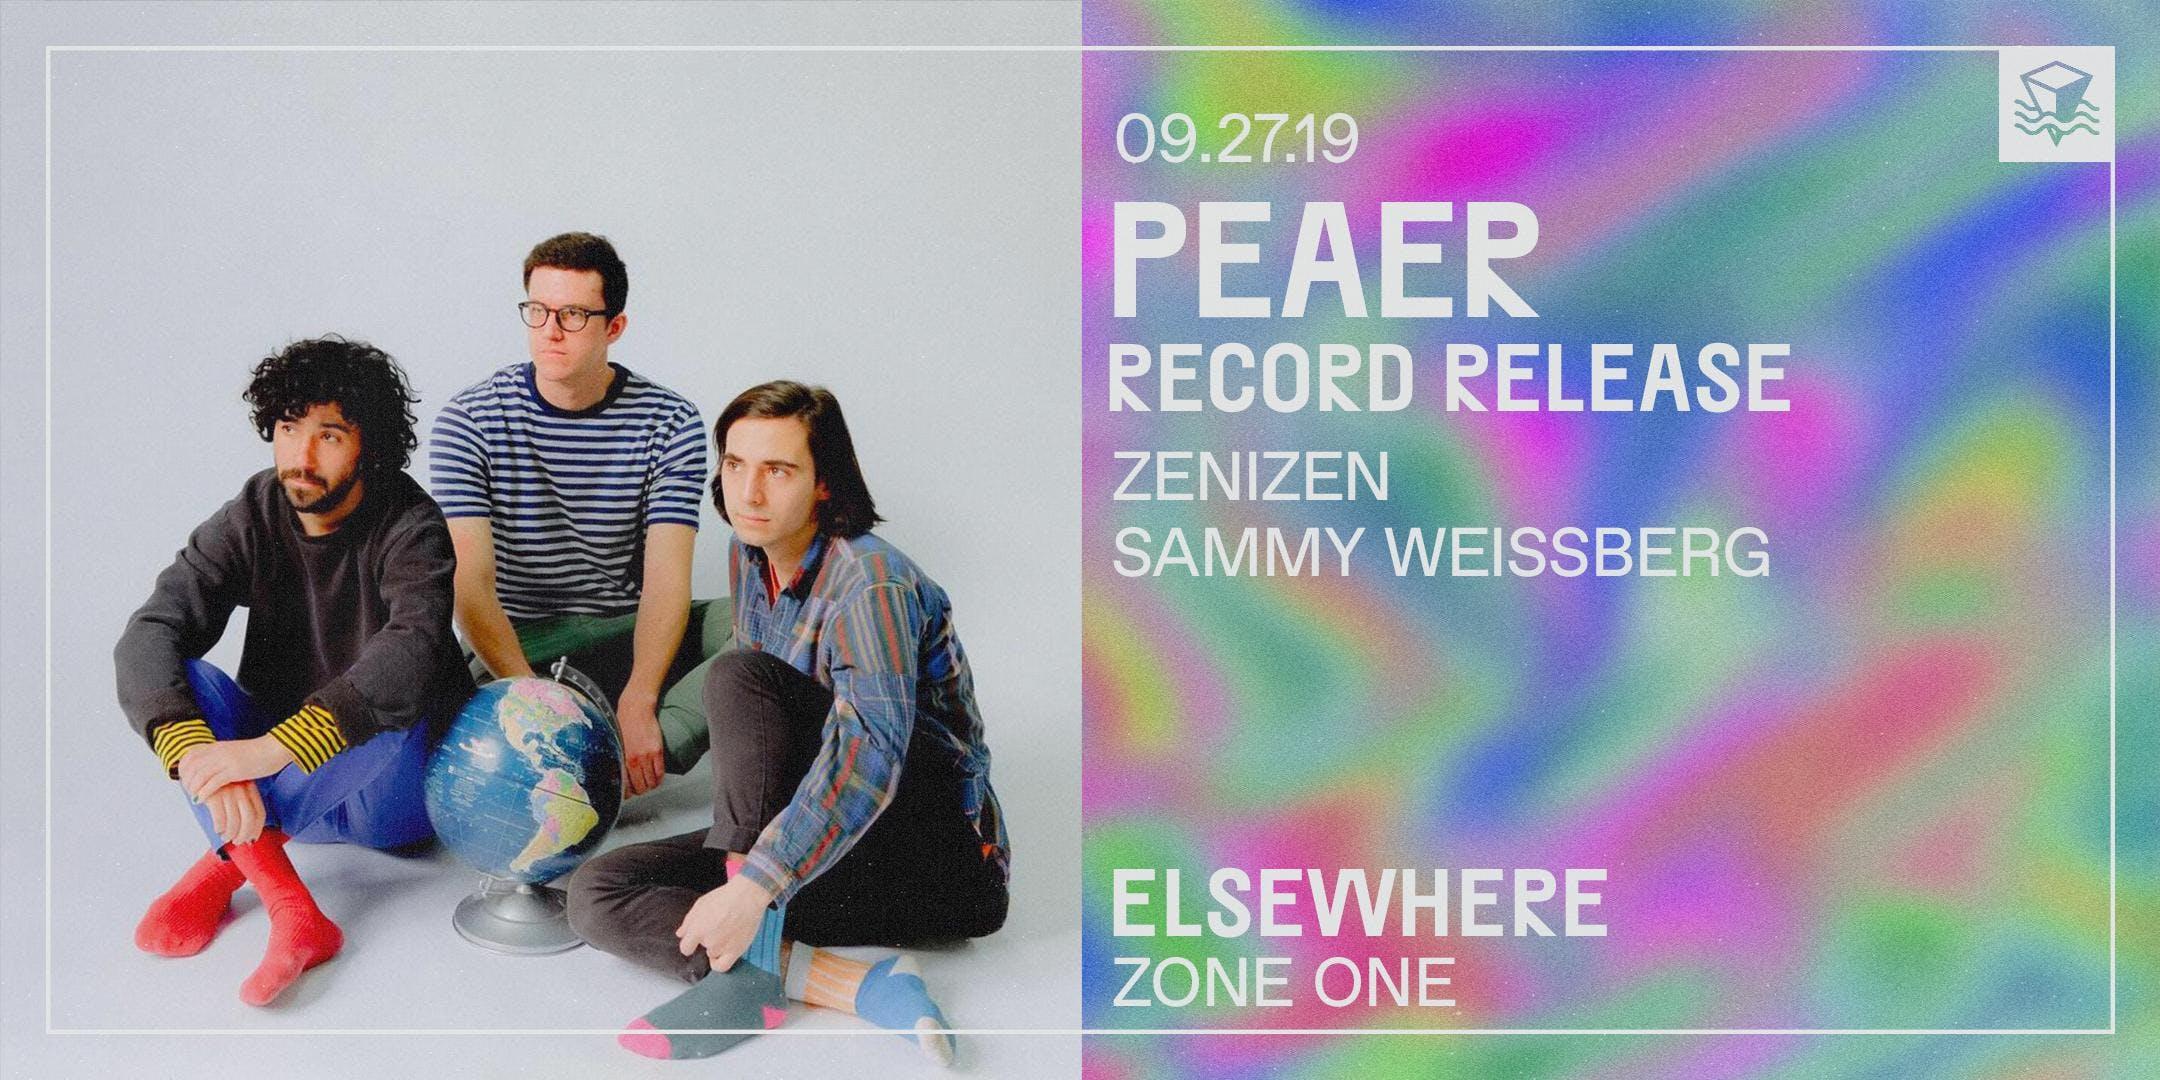 Peaer (Record Release!)